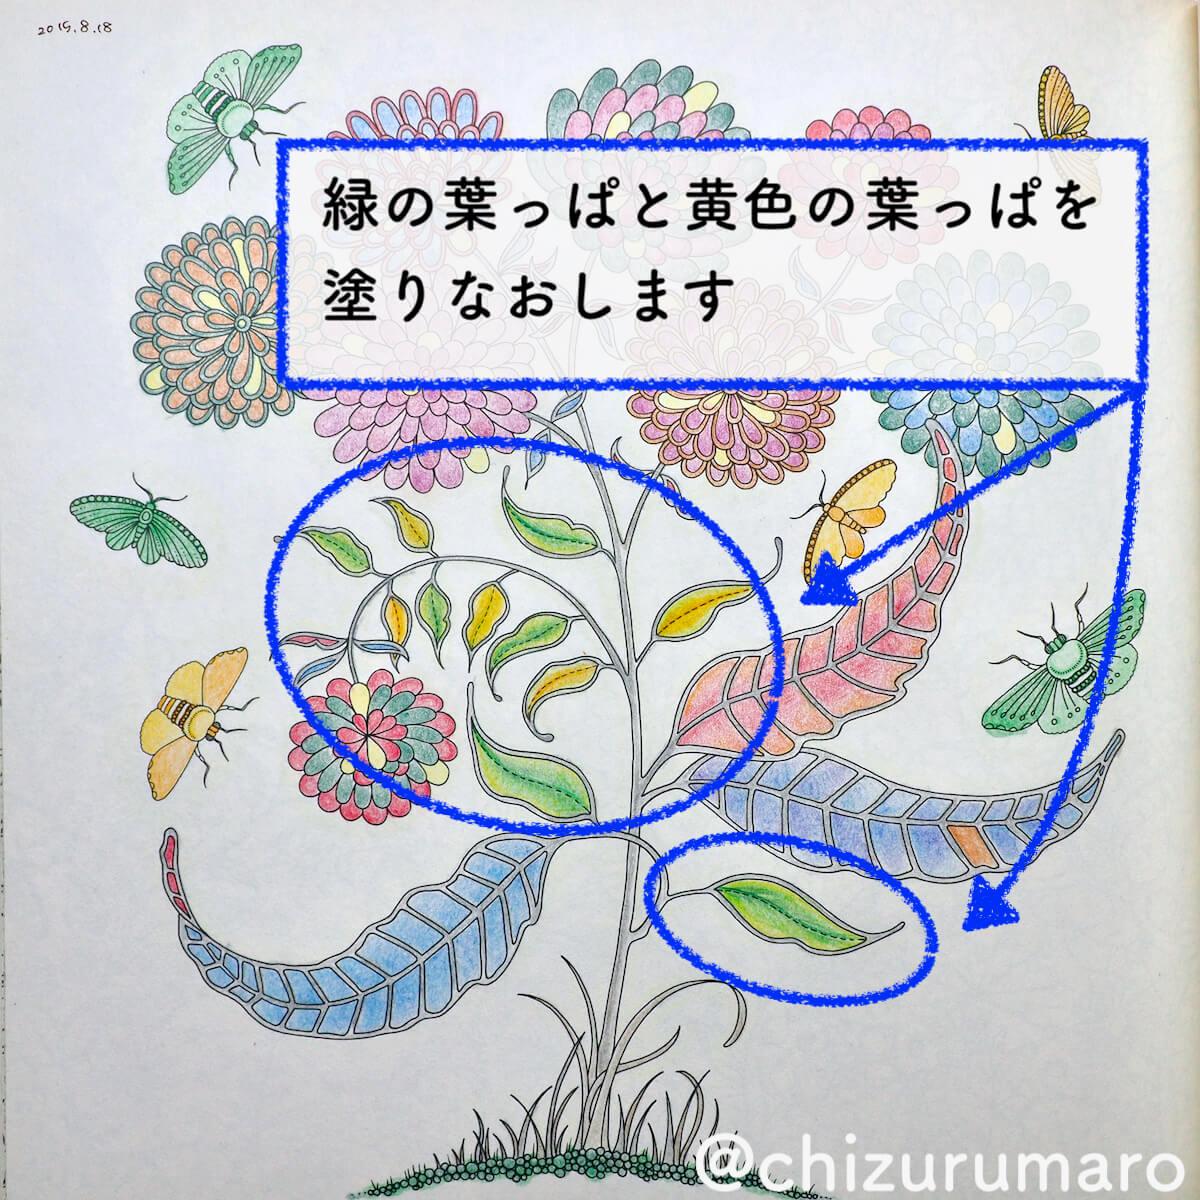 f:id:chizurumaro:20200518211515j:plain